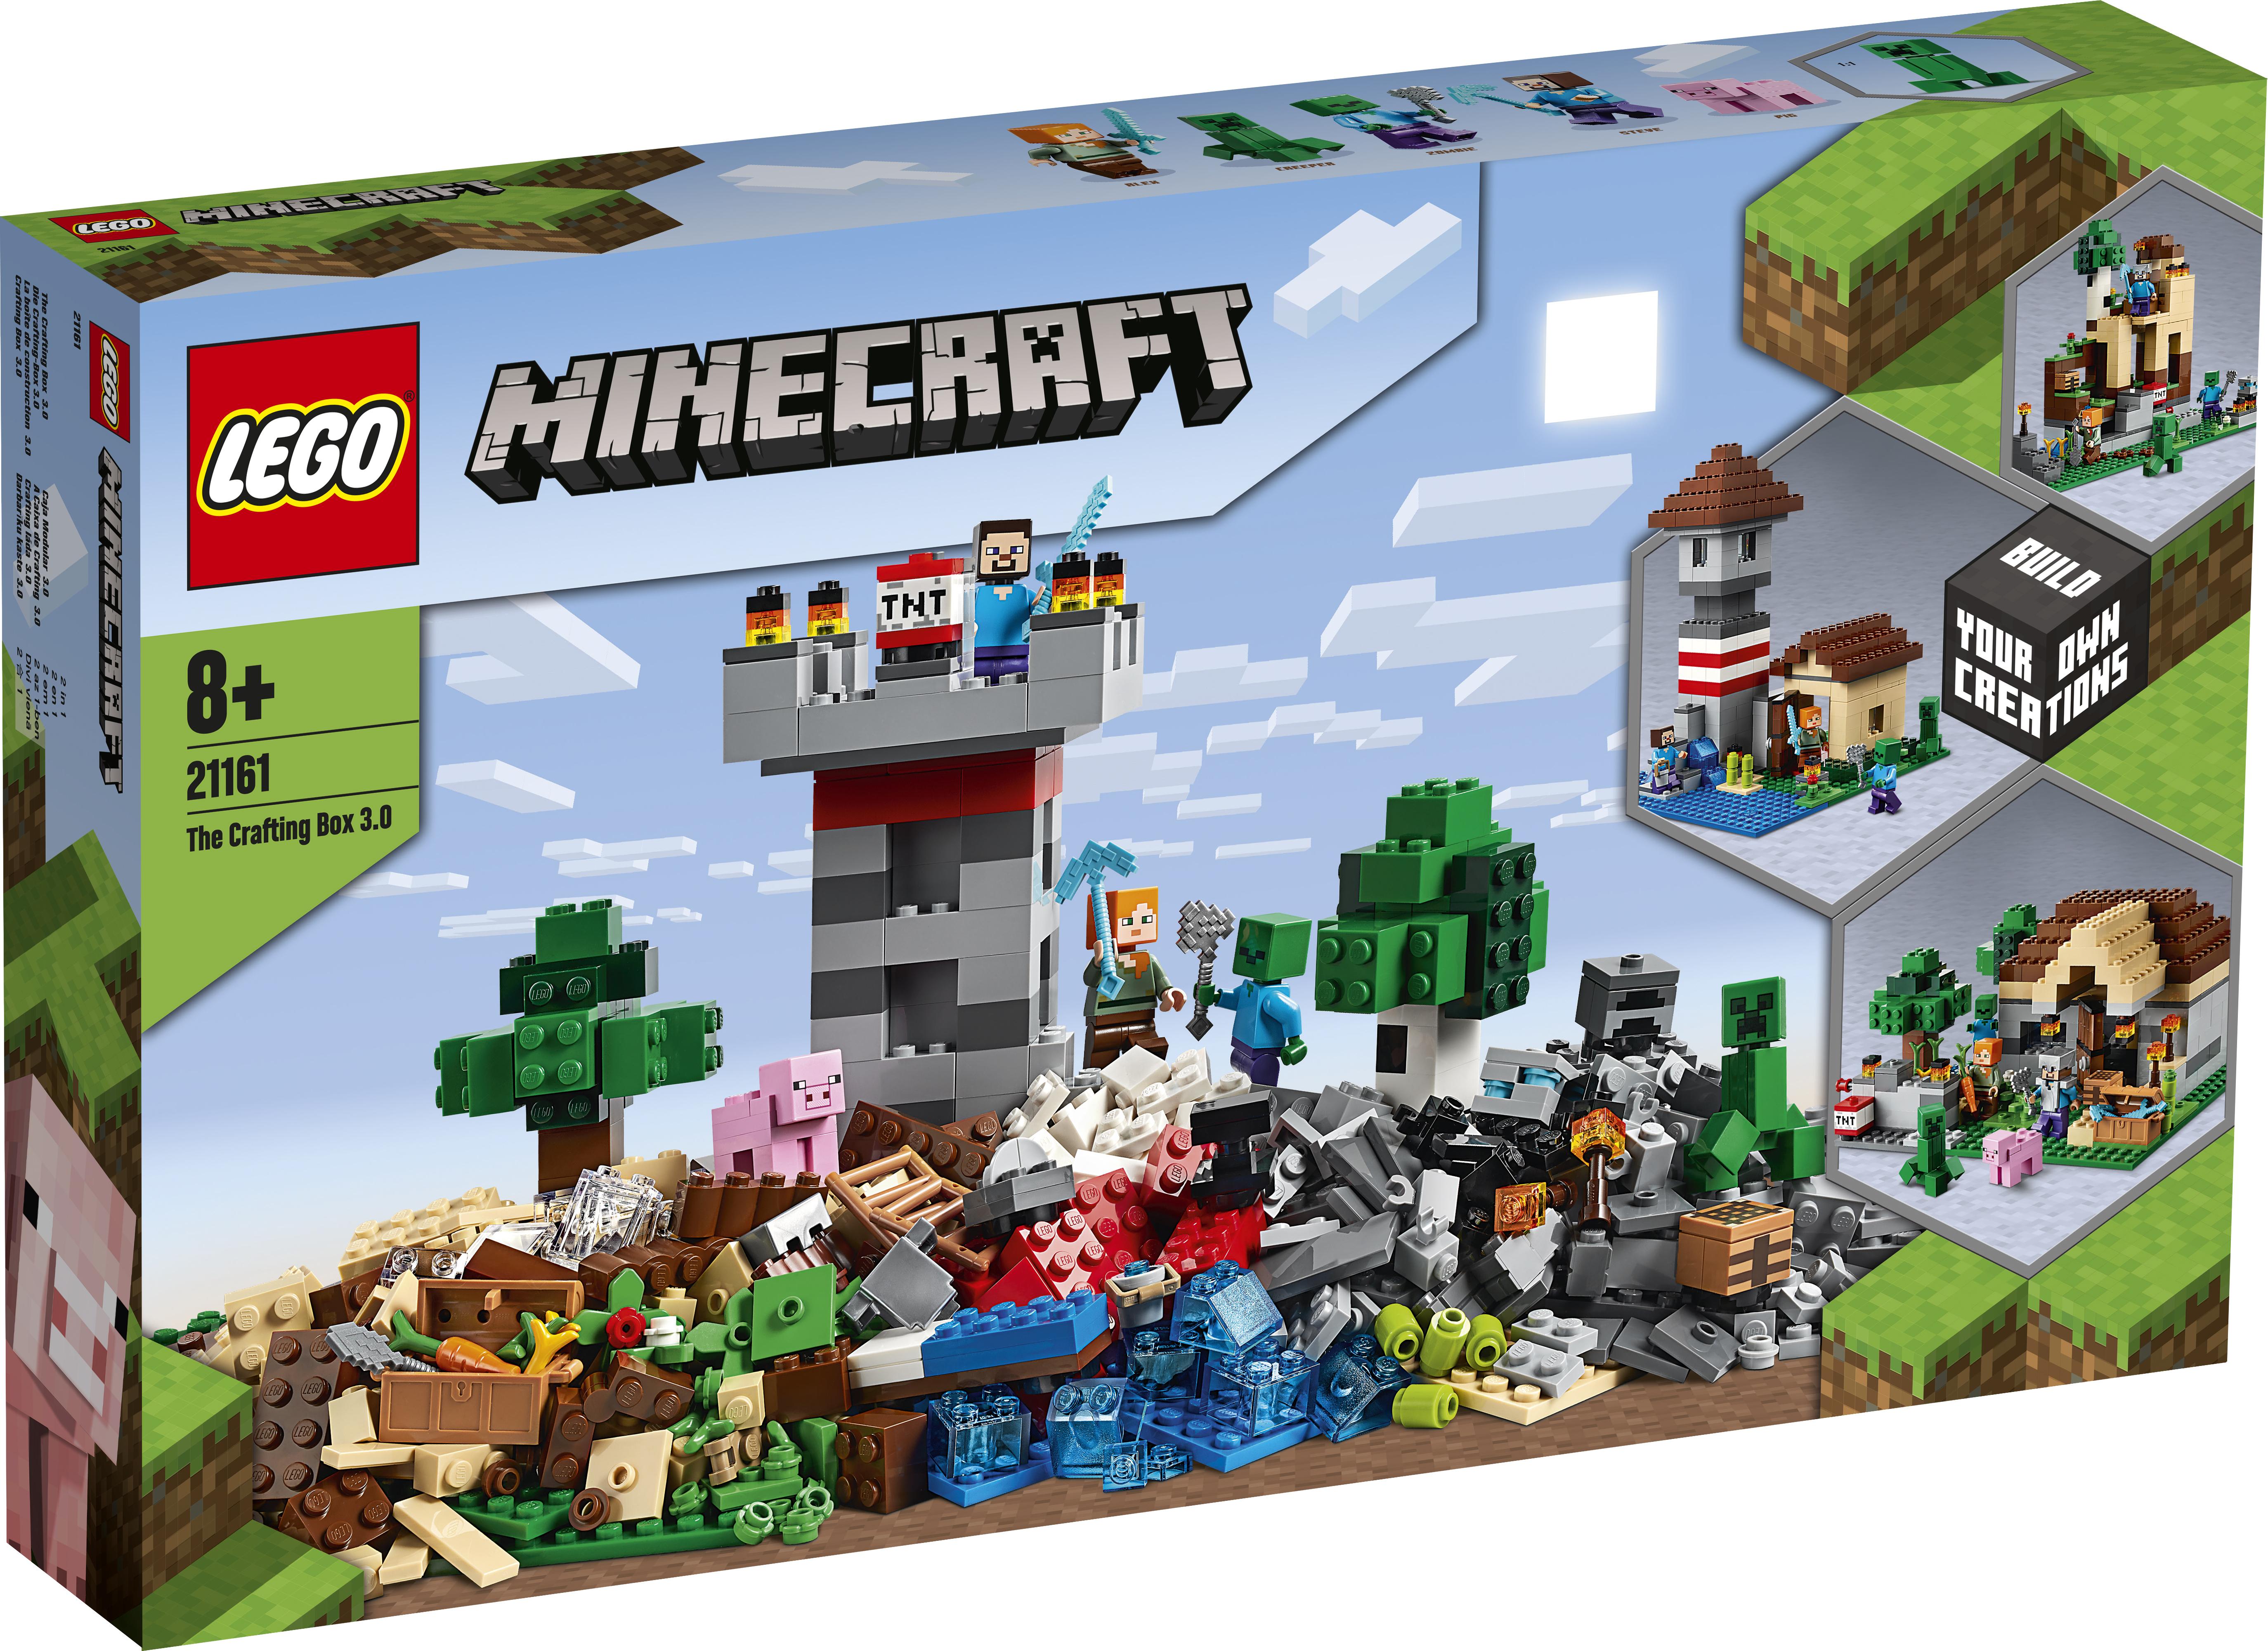 LEGO Minecraft Crafting-boks 3.0 - 21161